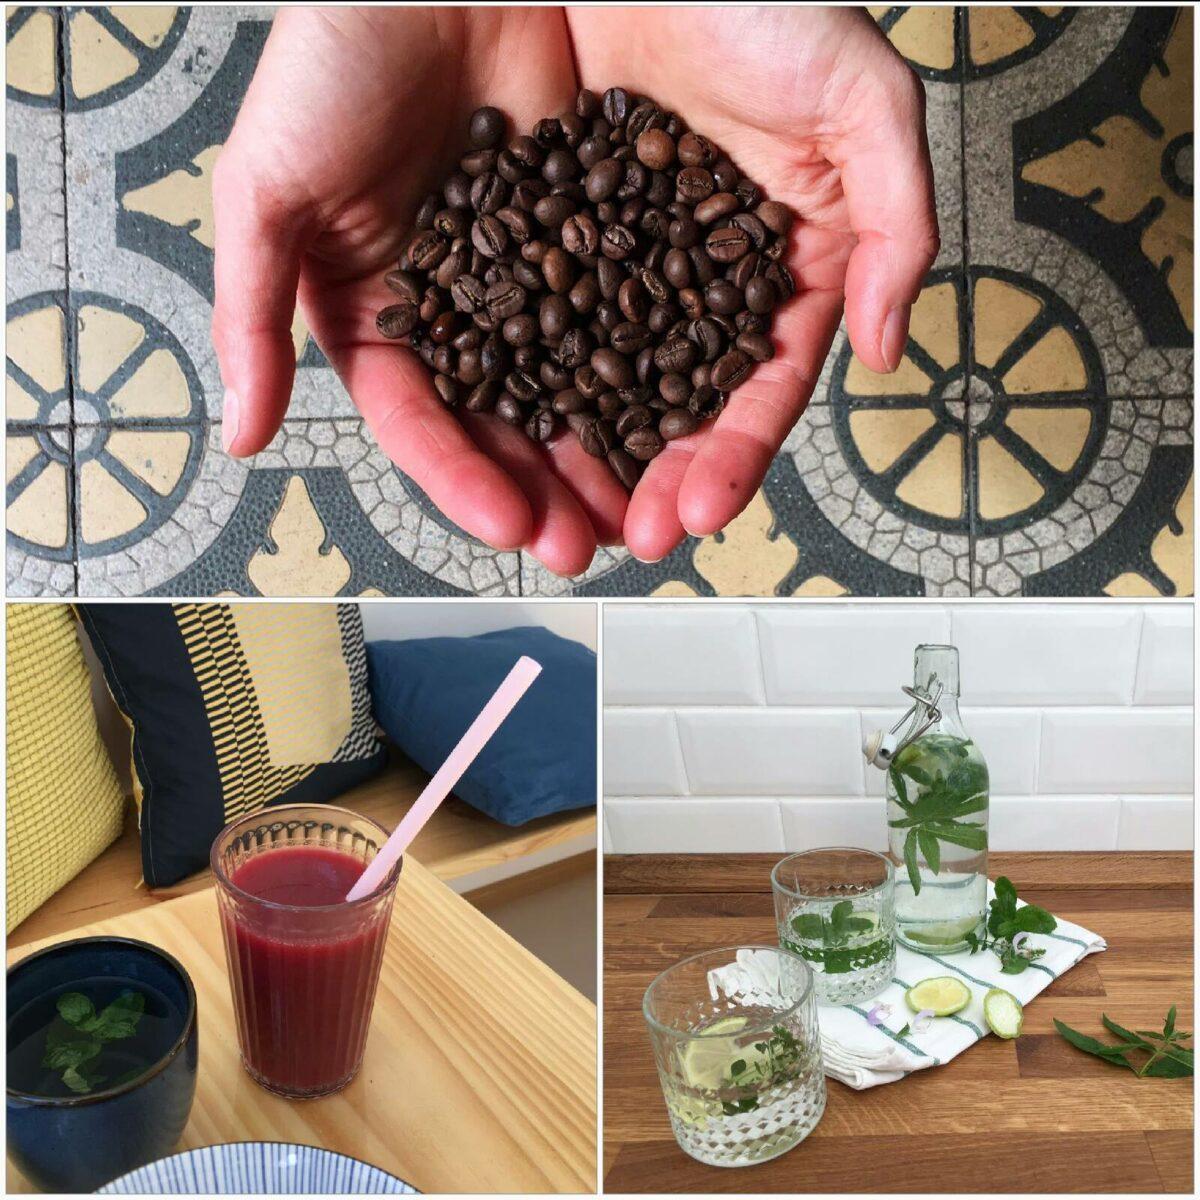 cafe-susann-kaiserslautern-fair-trinken-im-susann-kaffee-bohnen-minze-rote-bete